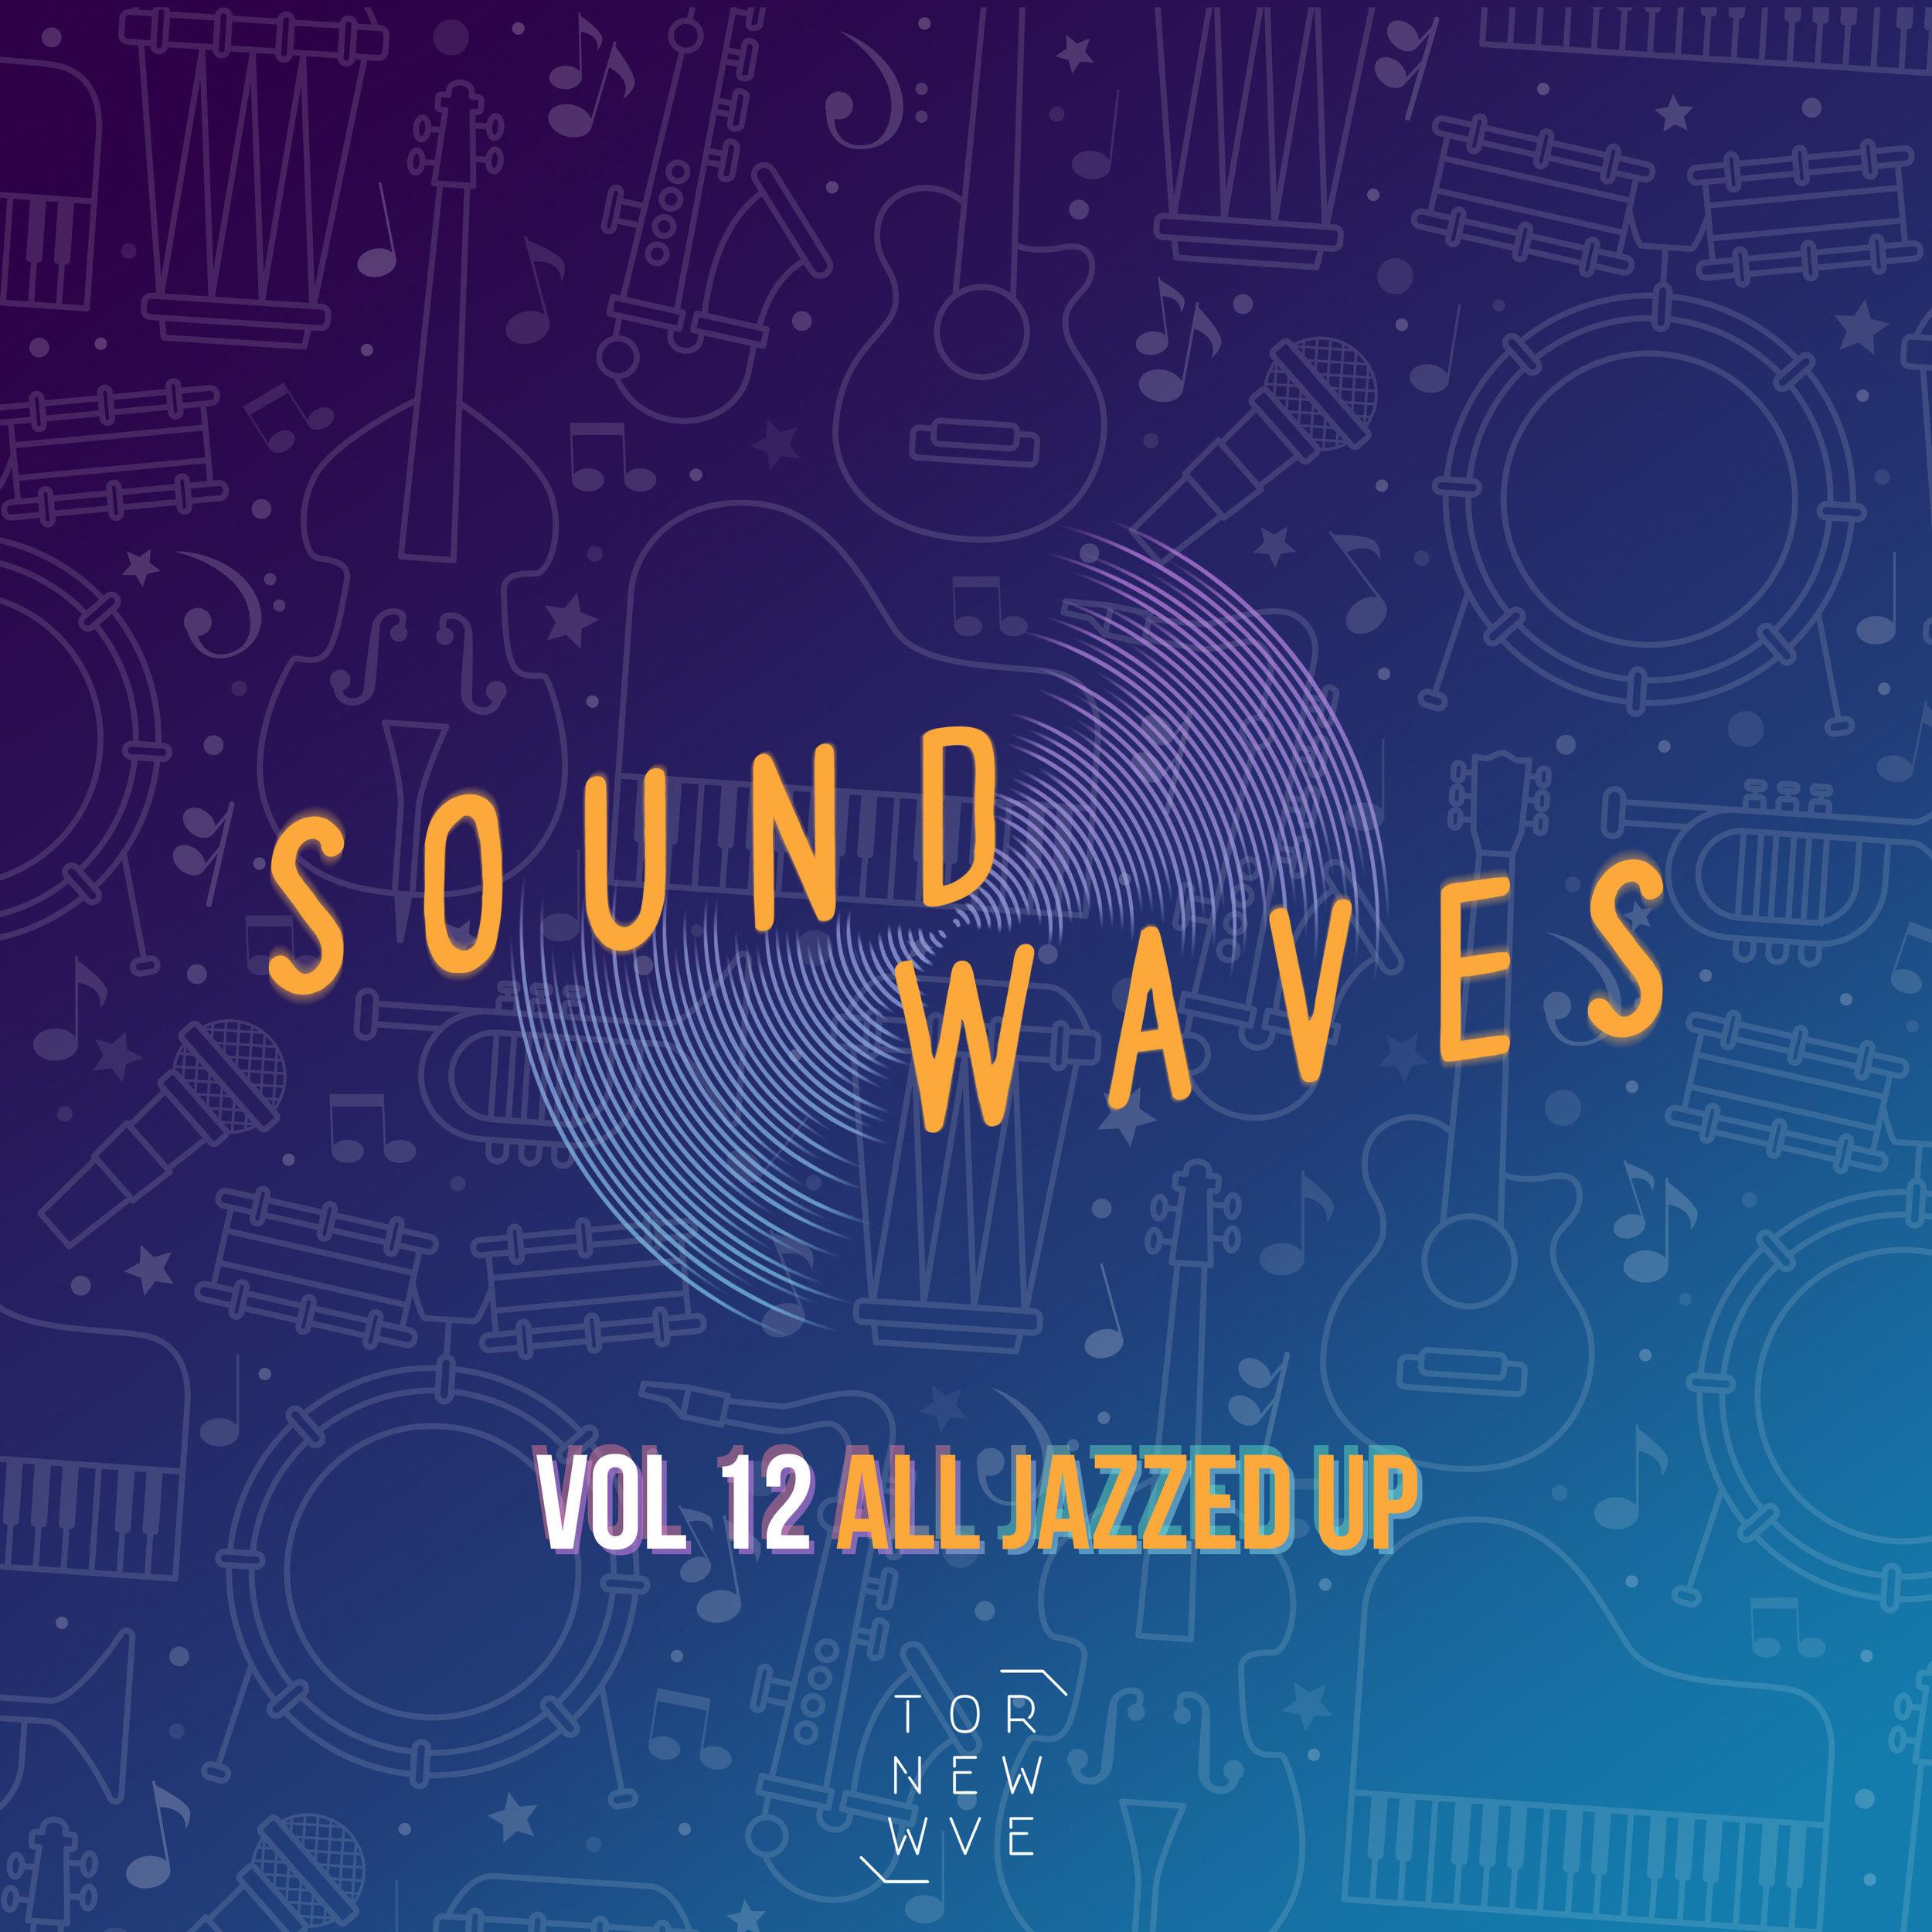 Sound waves vol 2.jpg